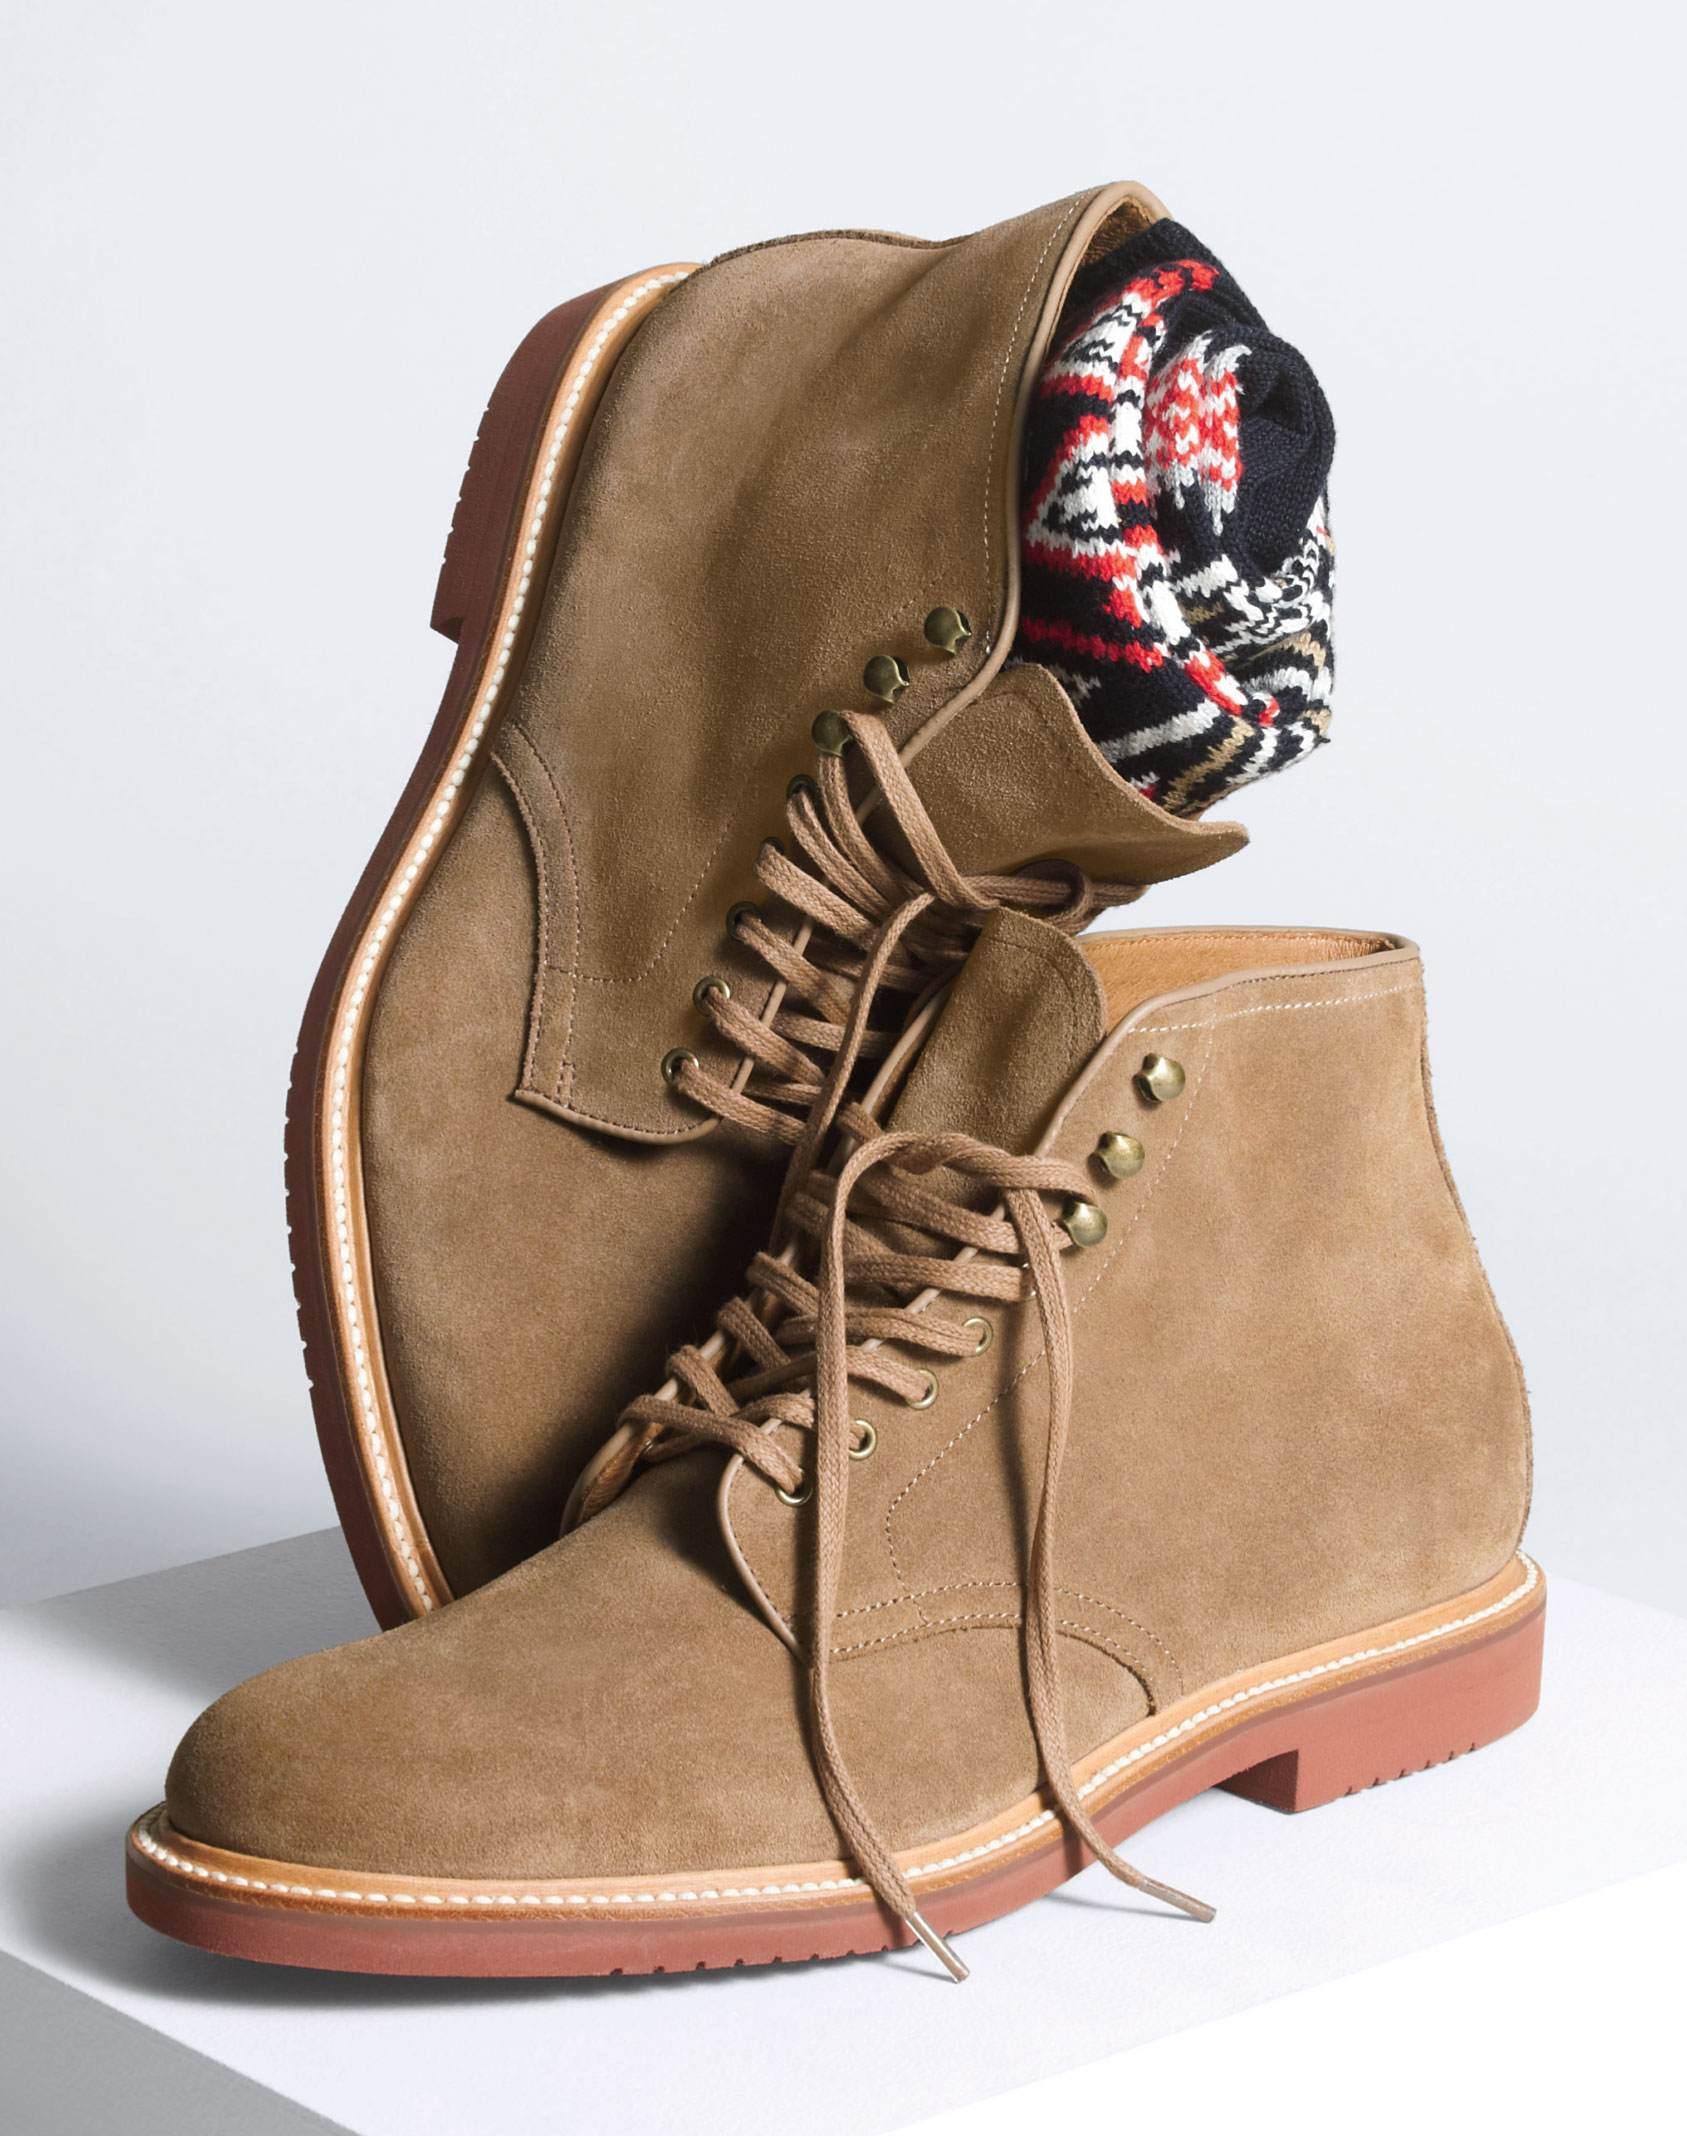 Jcrew_shoes_image.jpg